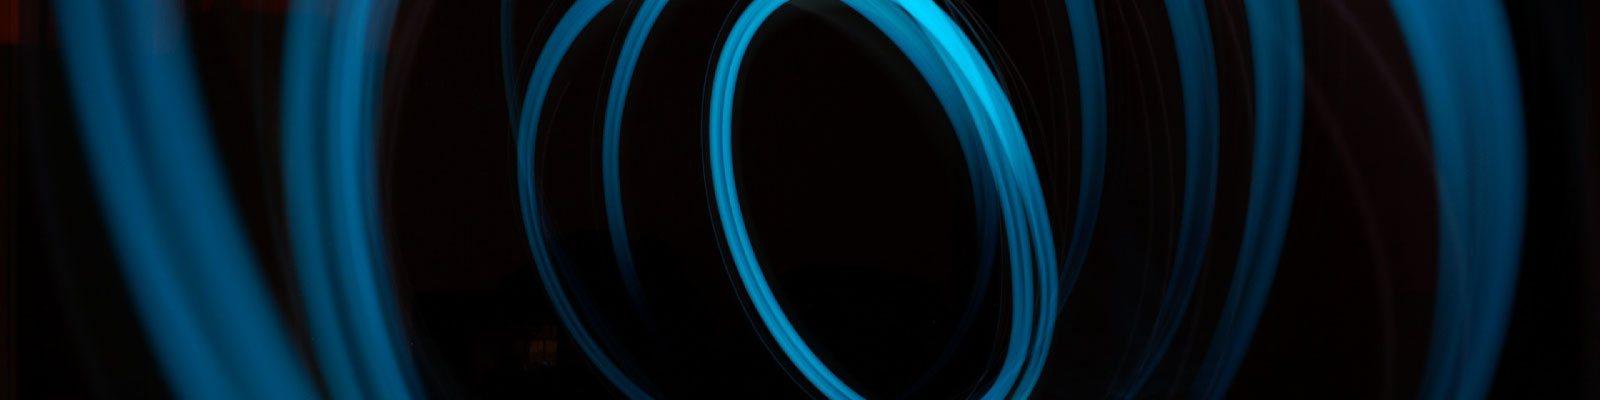 what is my ip address image black background with blue fiber optic swirls